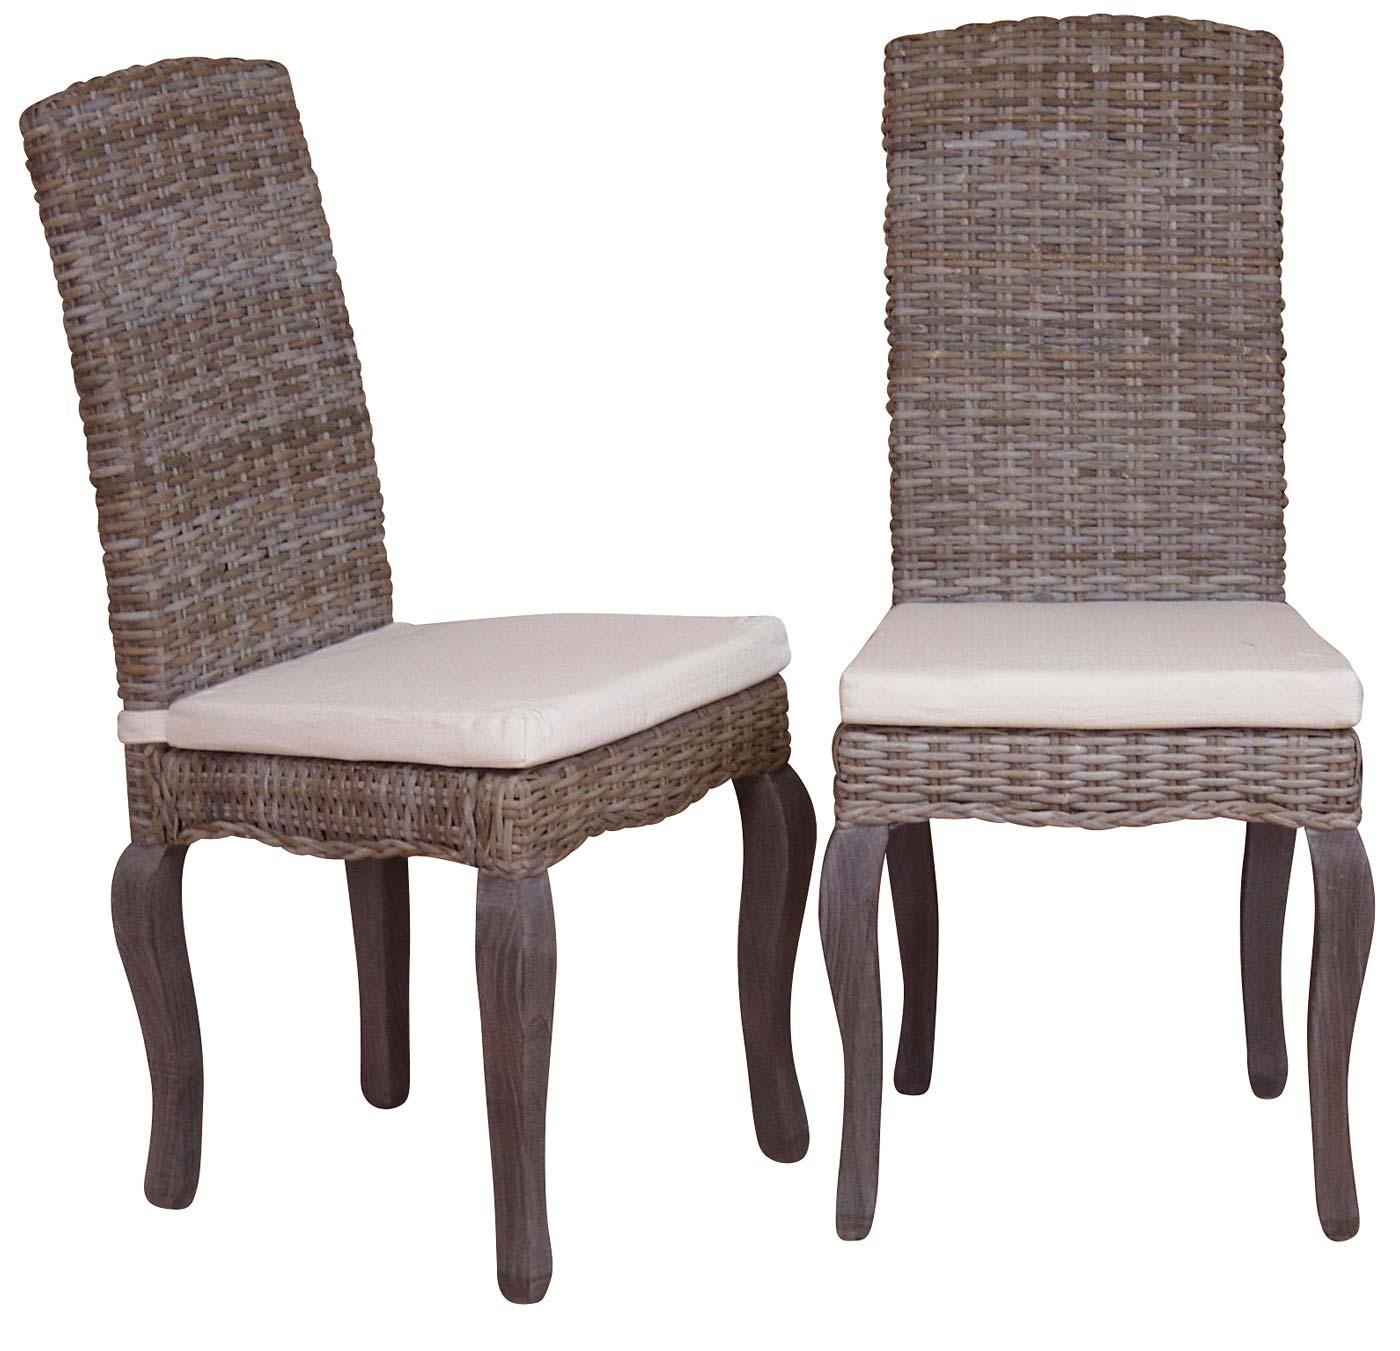 2x esszimmerstuhl h151 stuhl lehnstuhl rattanstuhl inkl sitzkissen kubu rattan grau f e braun. Black Bedroom Furniture Sets. Home Design Ideas